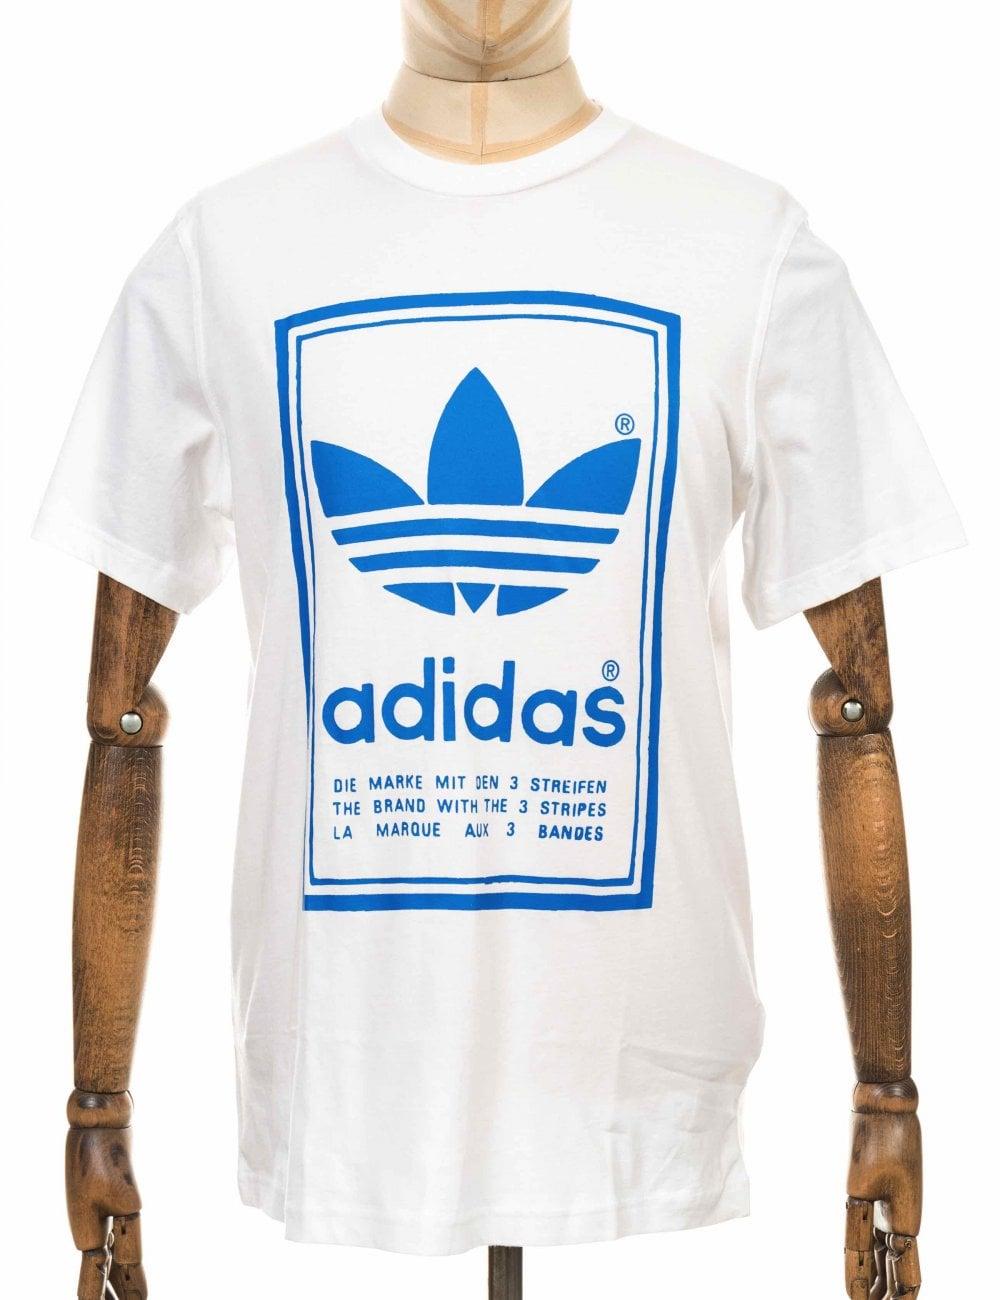 5ec1240d3 Cheap Vintage T Shirts Uk - Gomes Weine AG